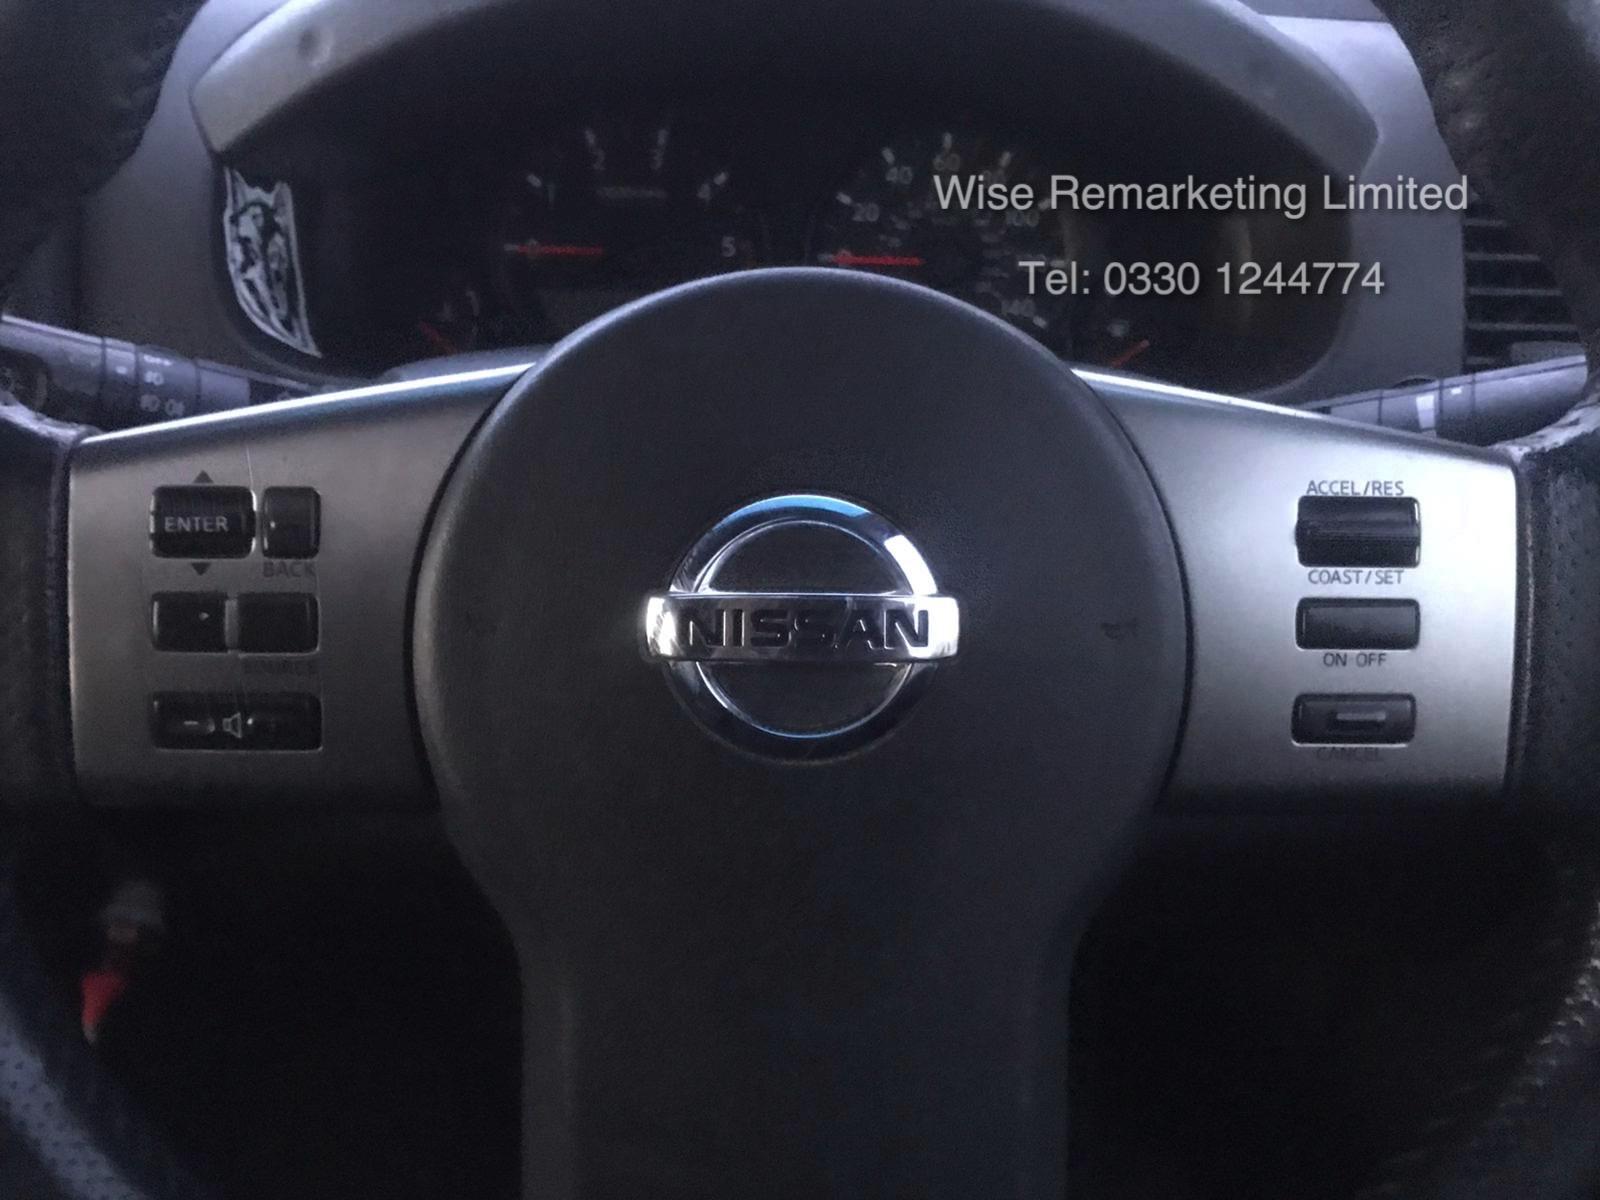 Lot 19 - Nissan Navara Aventura Double Cab 2.5DCI - Auto - 2007 07 Reg - Full Leather - Sun roof - 4x4